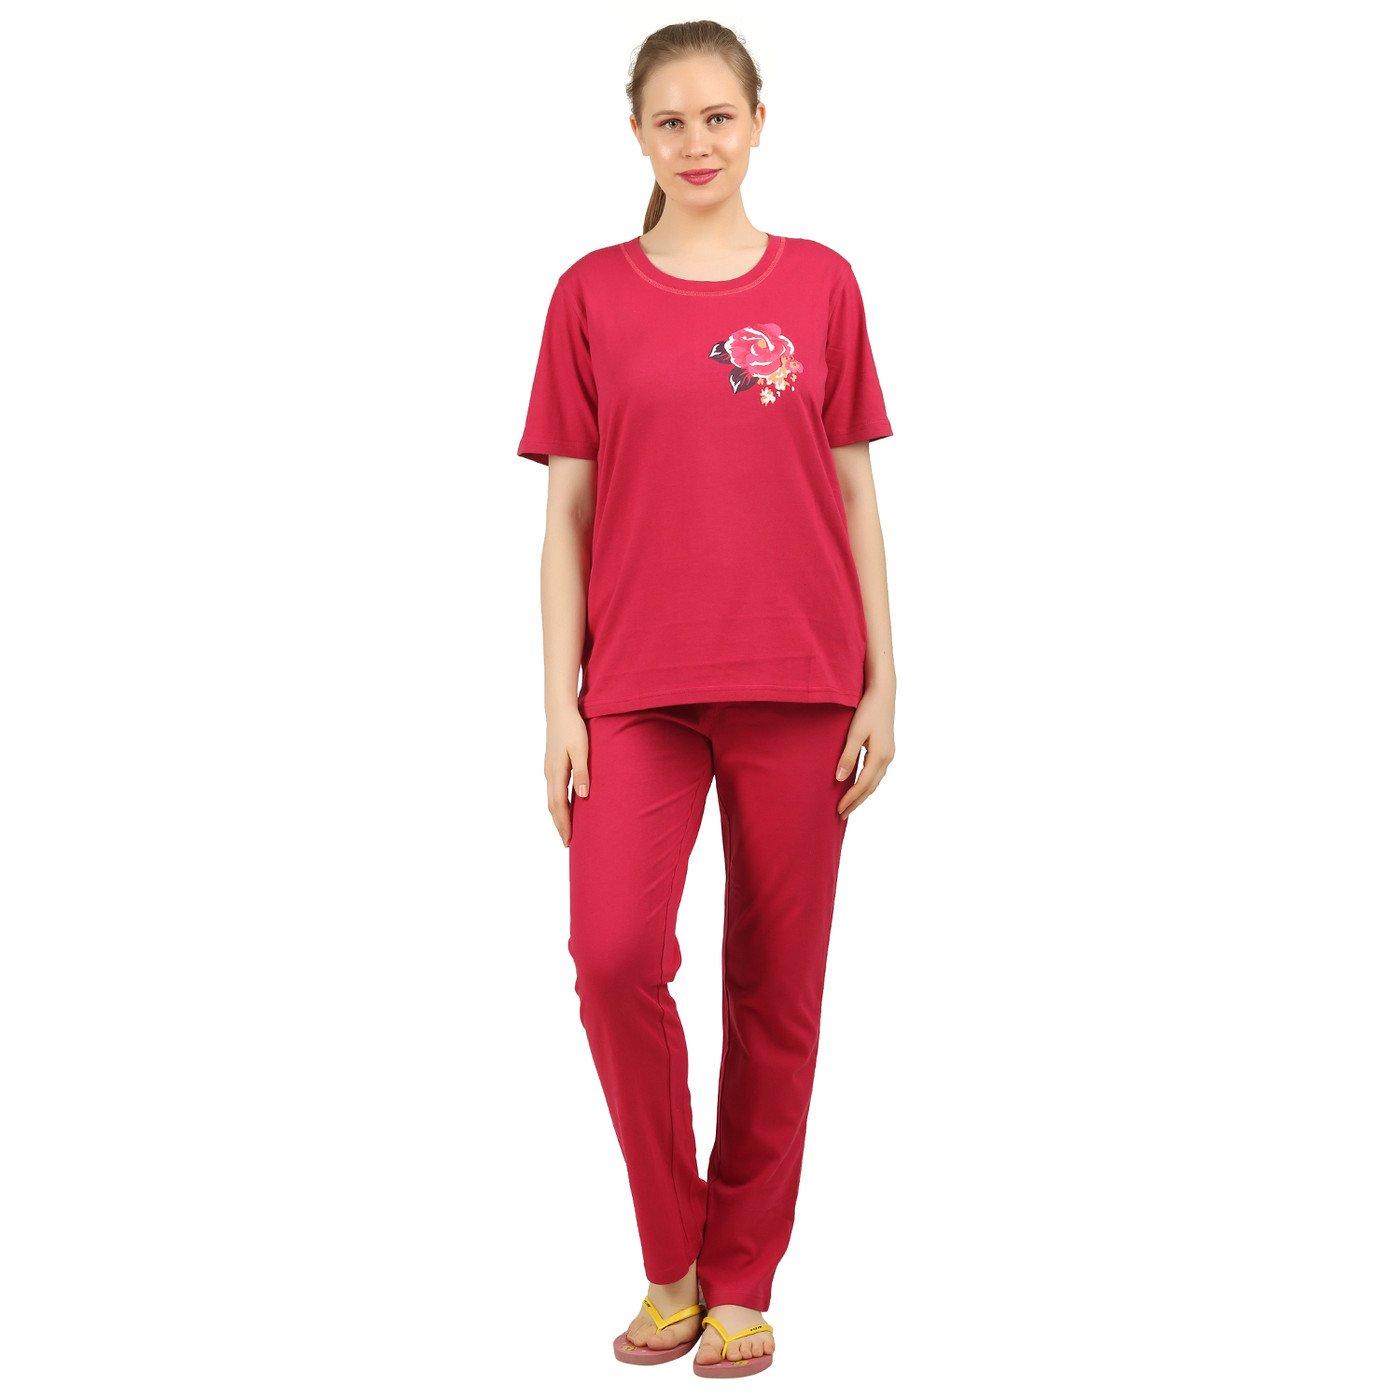 bd29e19c9 Clifton Womens Rose Printed Nightwear Pajama Set -Red at Amazon Women s  Clothing store